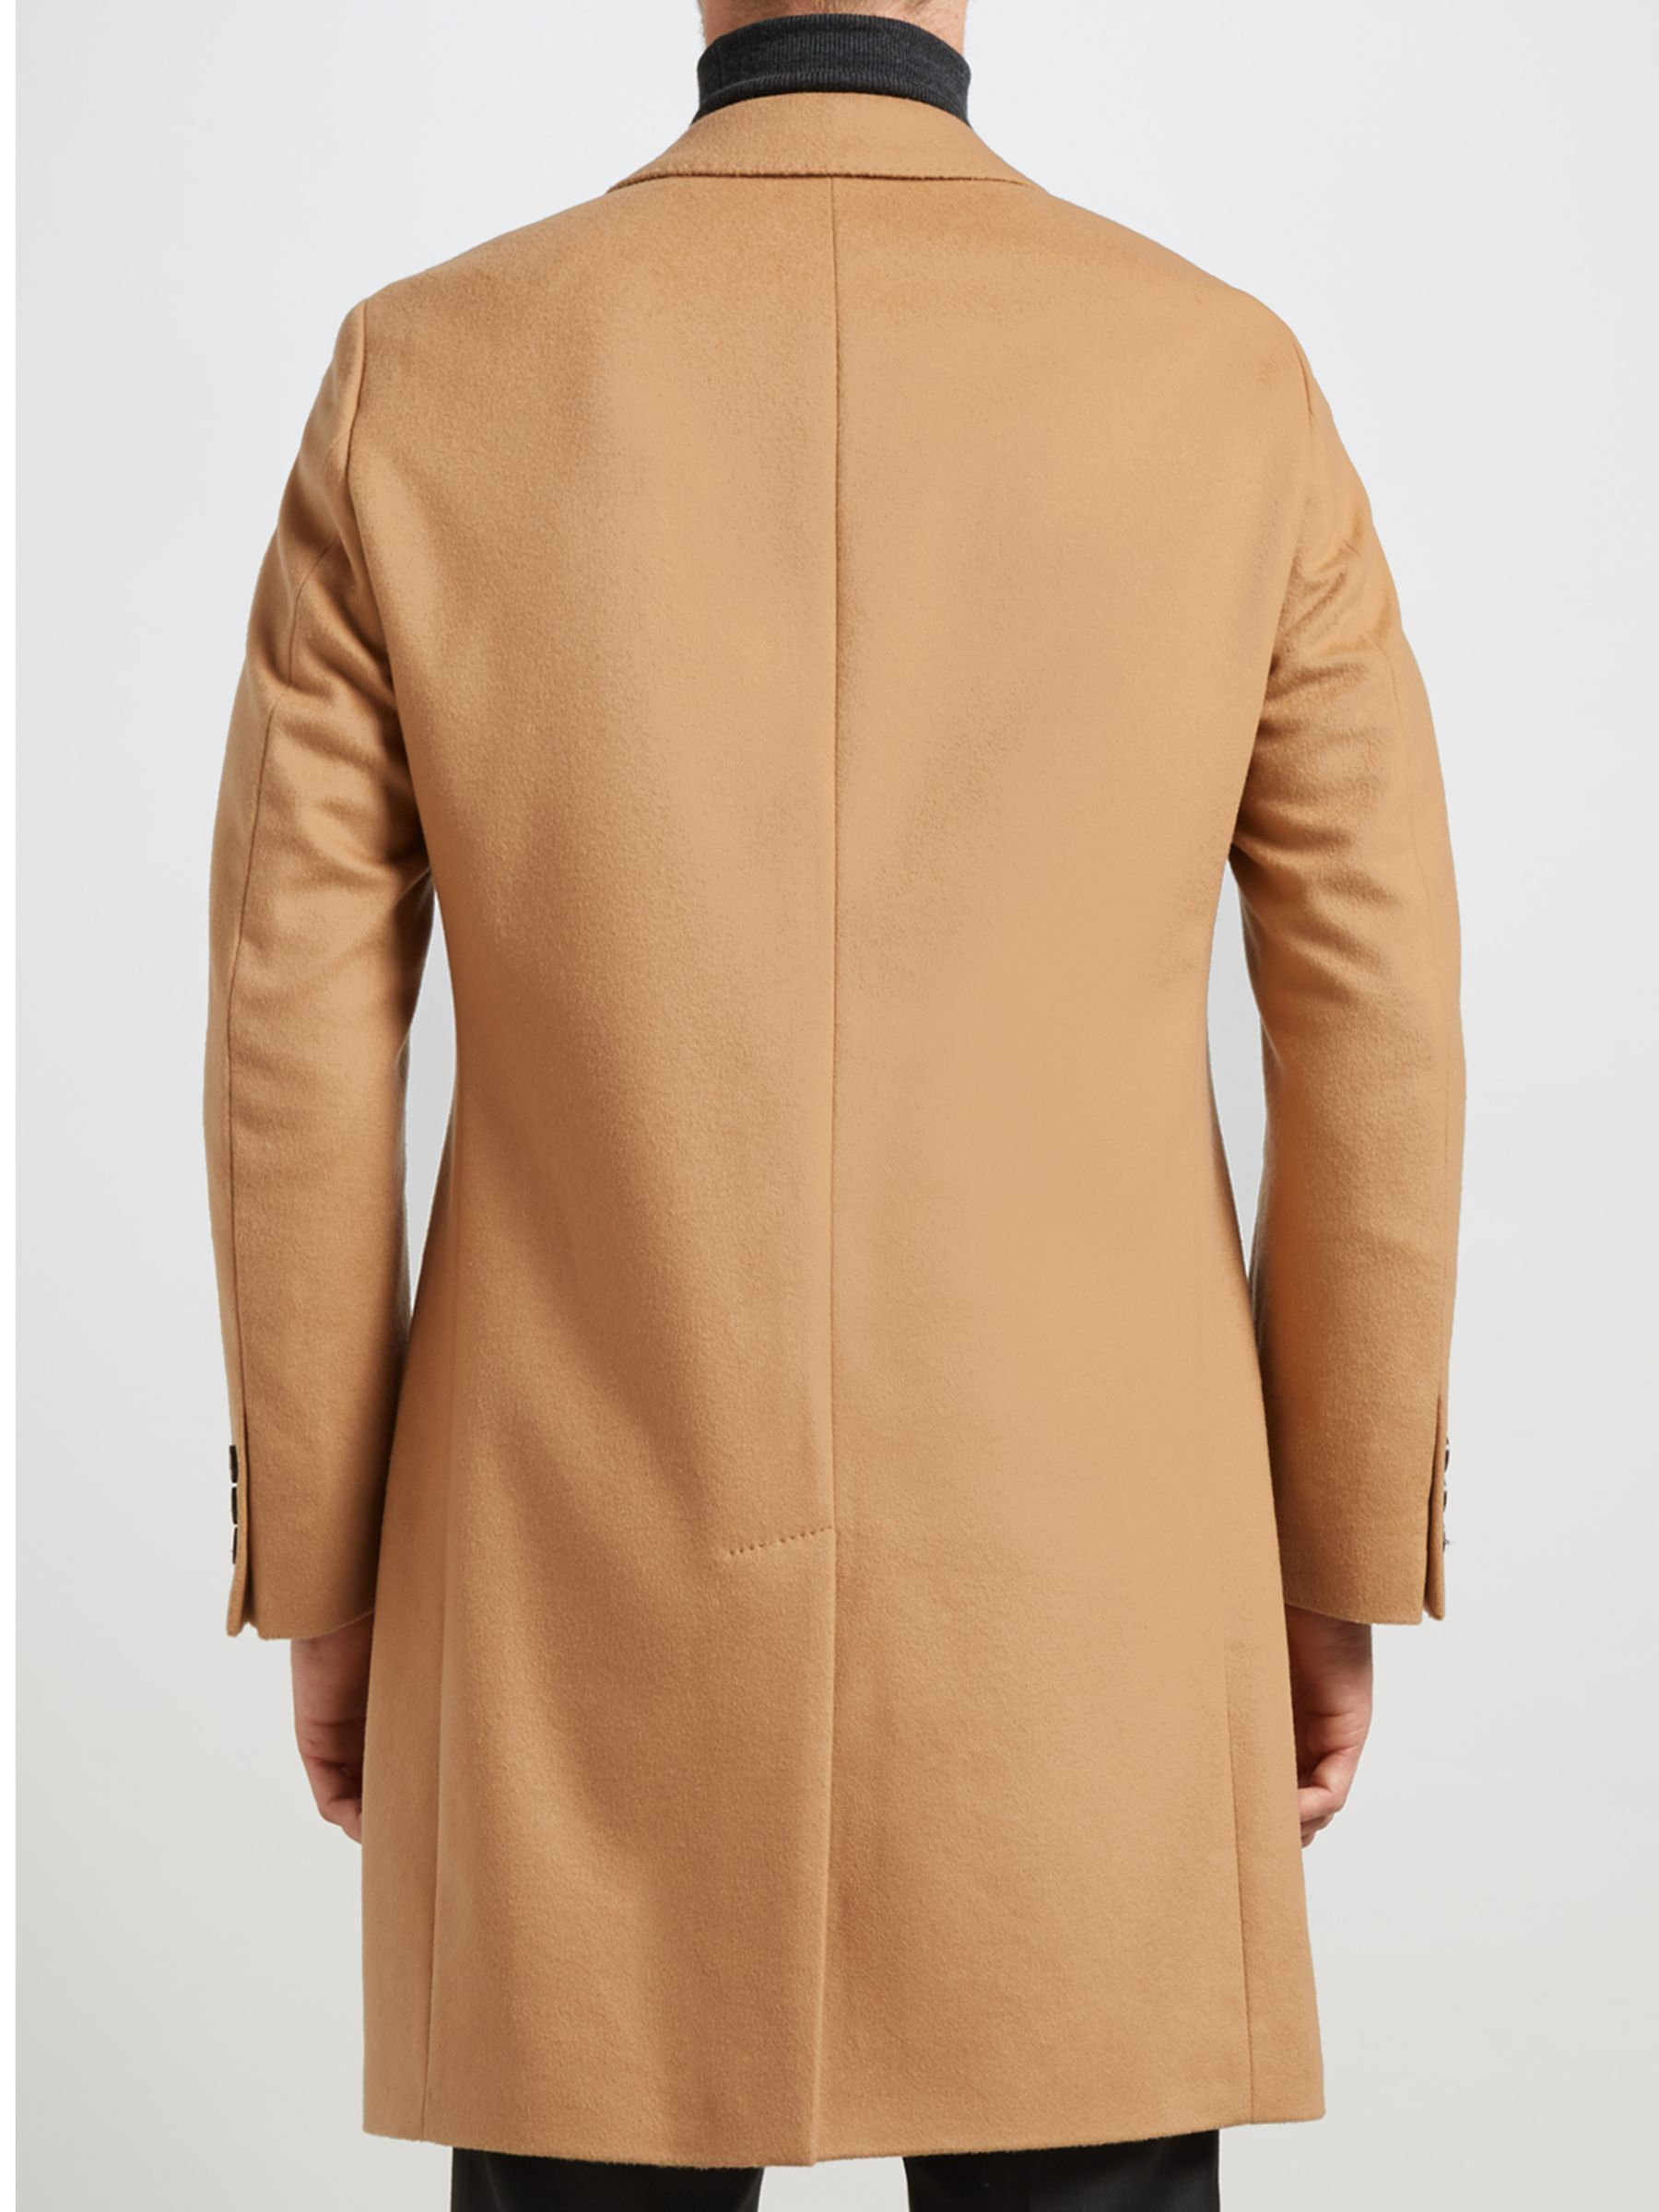 camel coat hugo boss